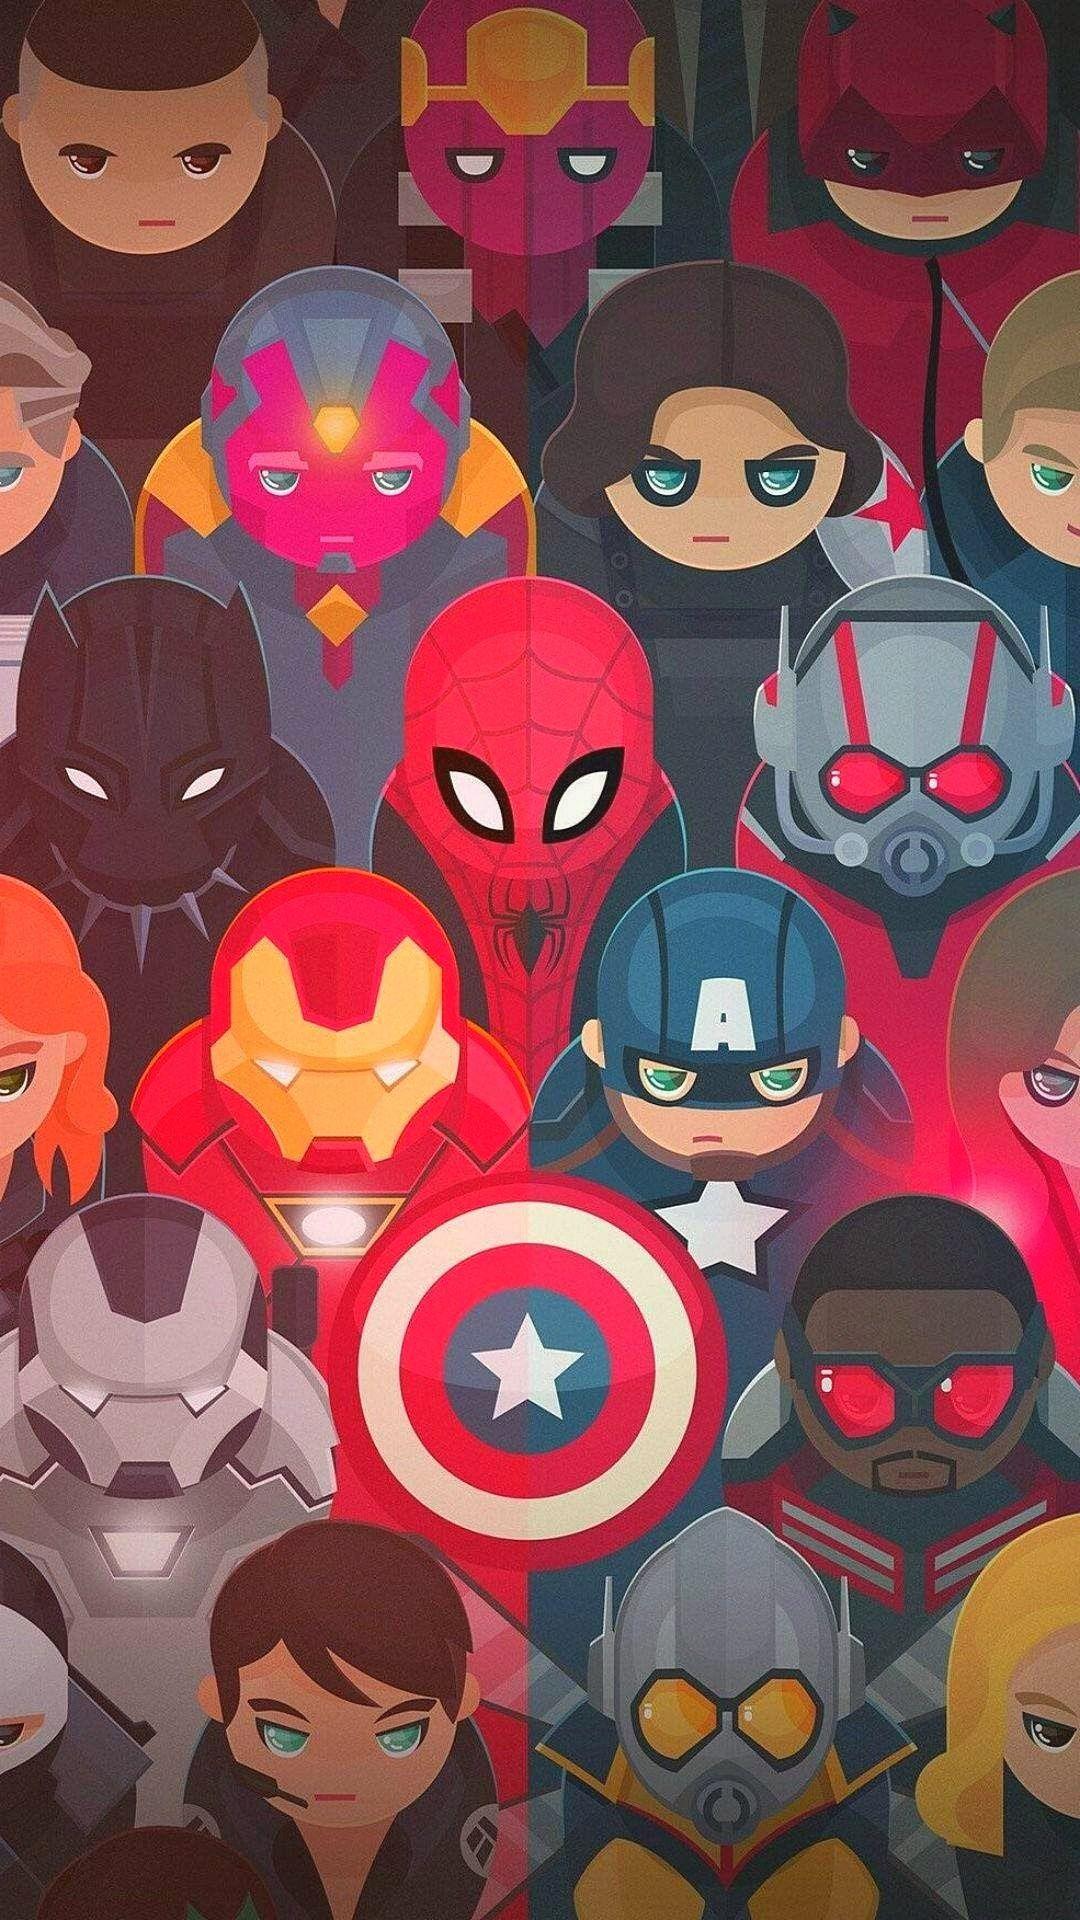 Avengers Superheros Minimal Wallpaper 1080x1920 Avengers Wallpaper Superhero Wallpaper Marvel Wallpaper